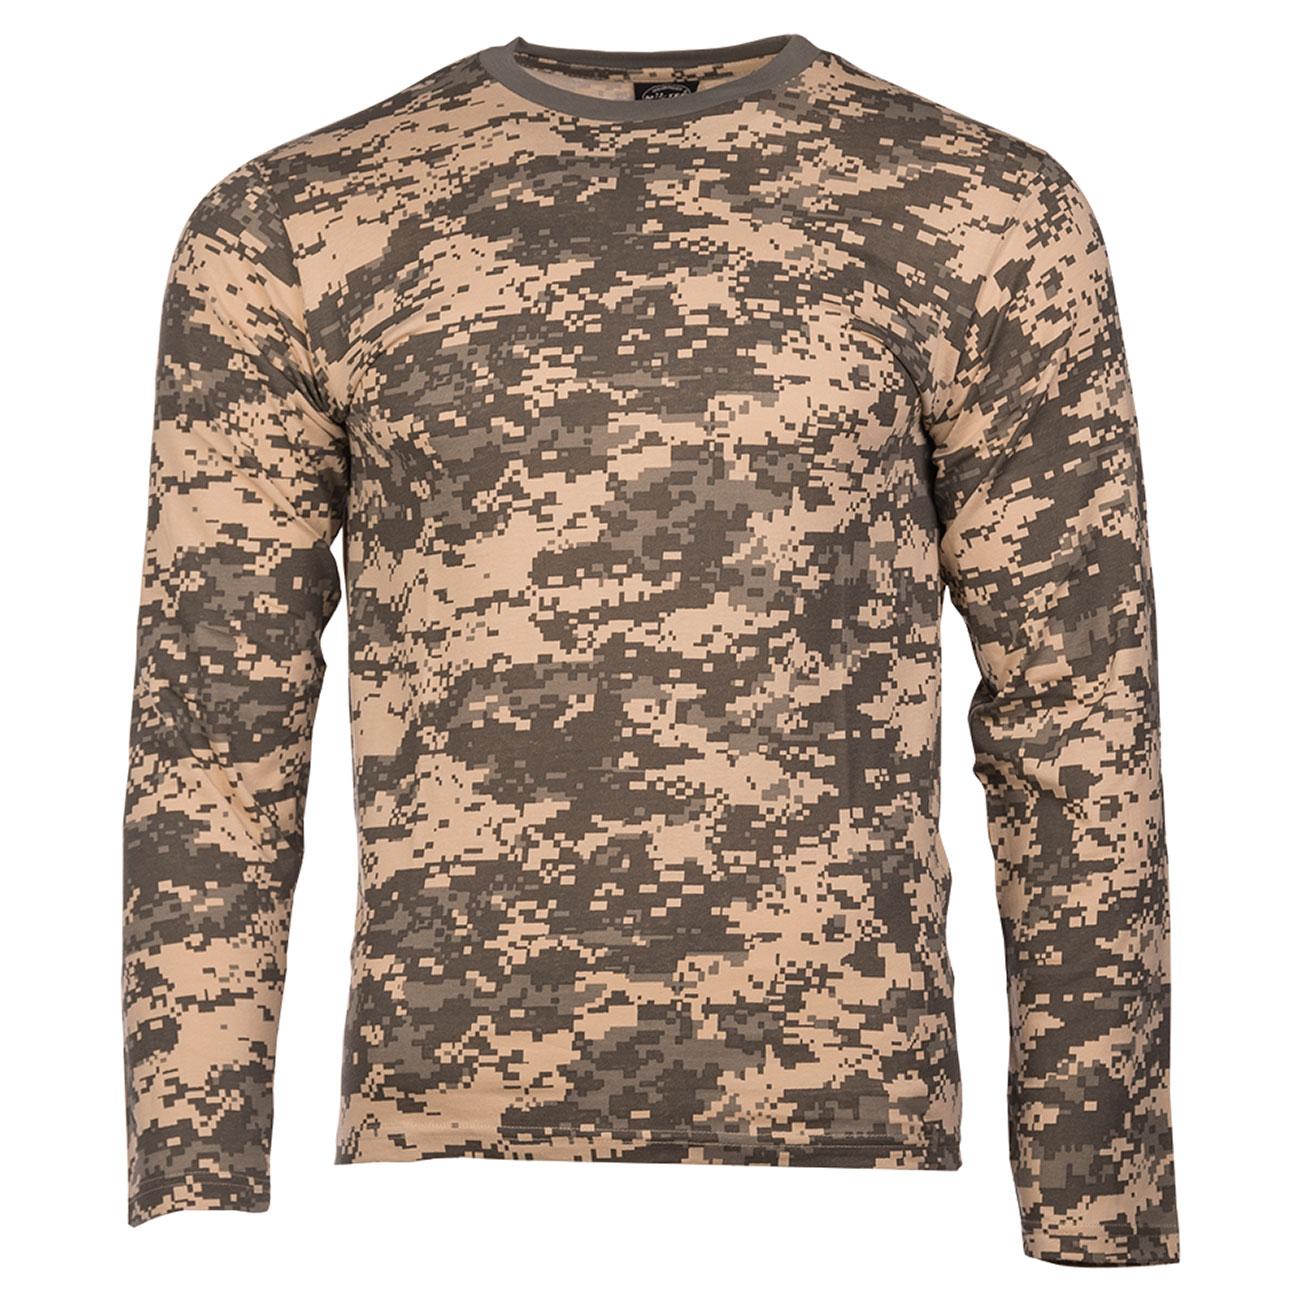 f36afa4dc23a71 Mil-Tec Langarmshirt AT-digital günstig kaufen - Kotte & Zeller